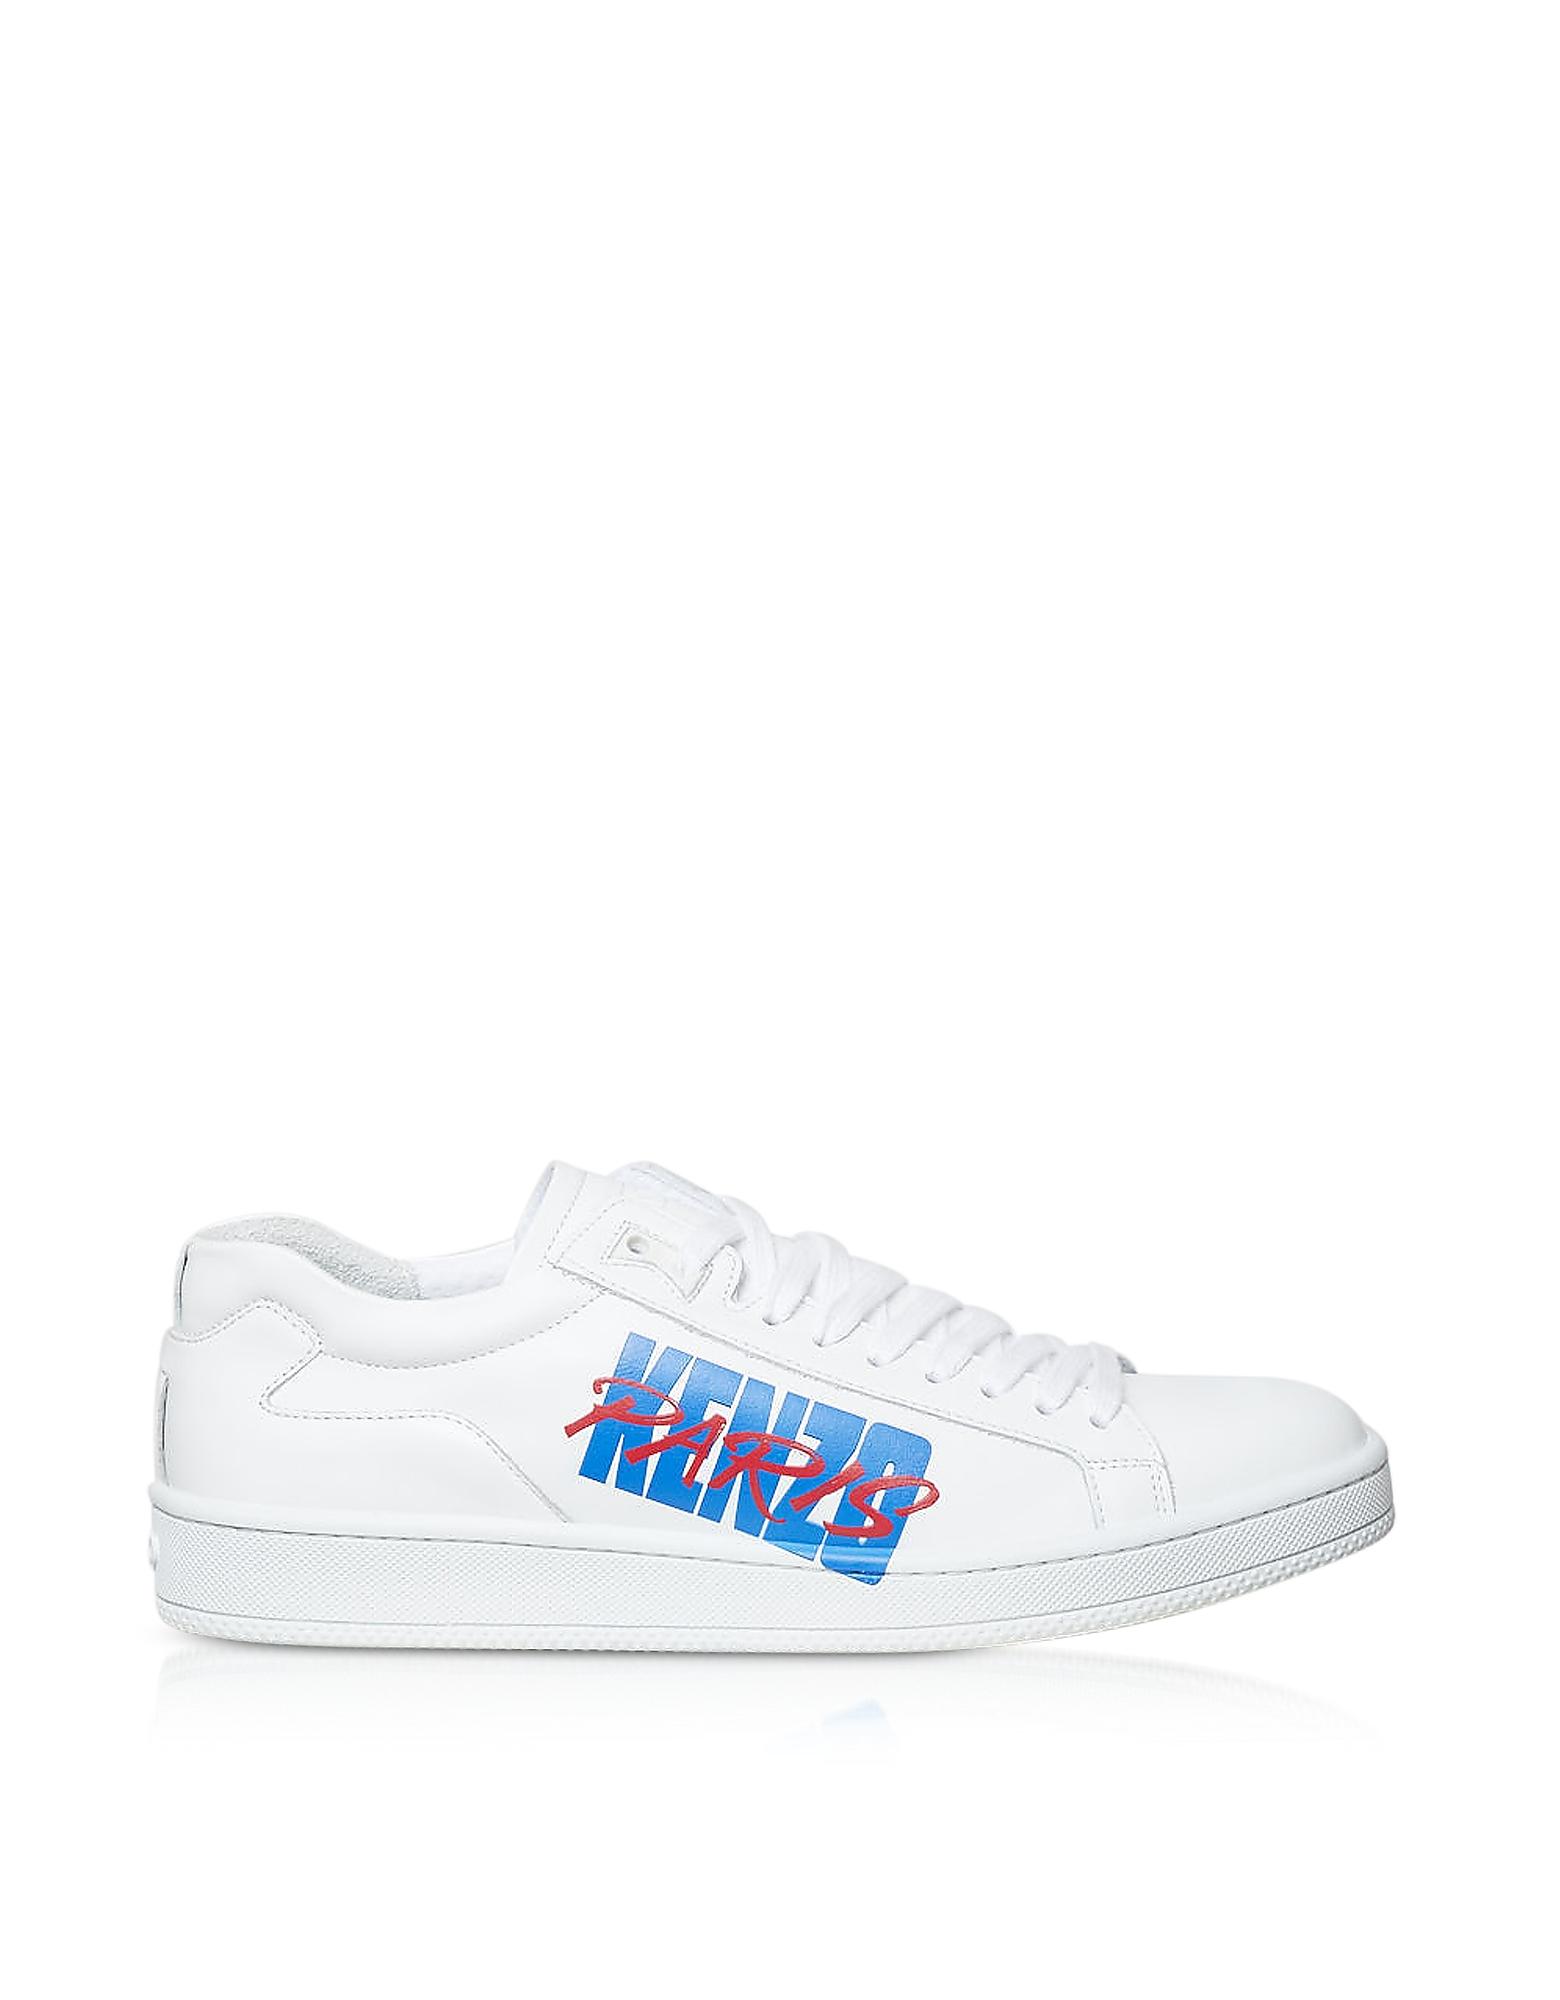 Tennix White Leather Men's Sneakers